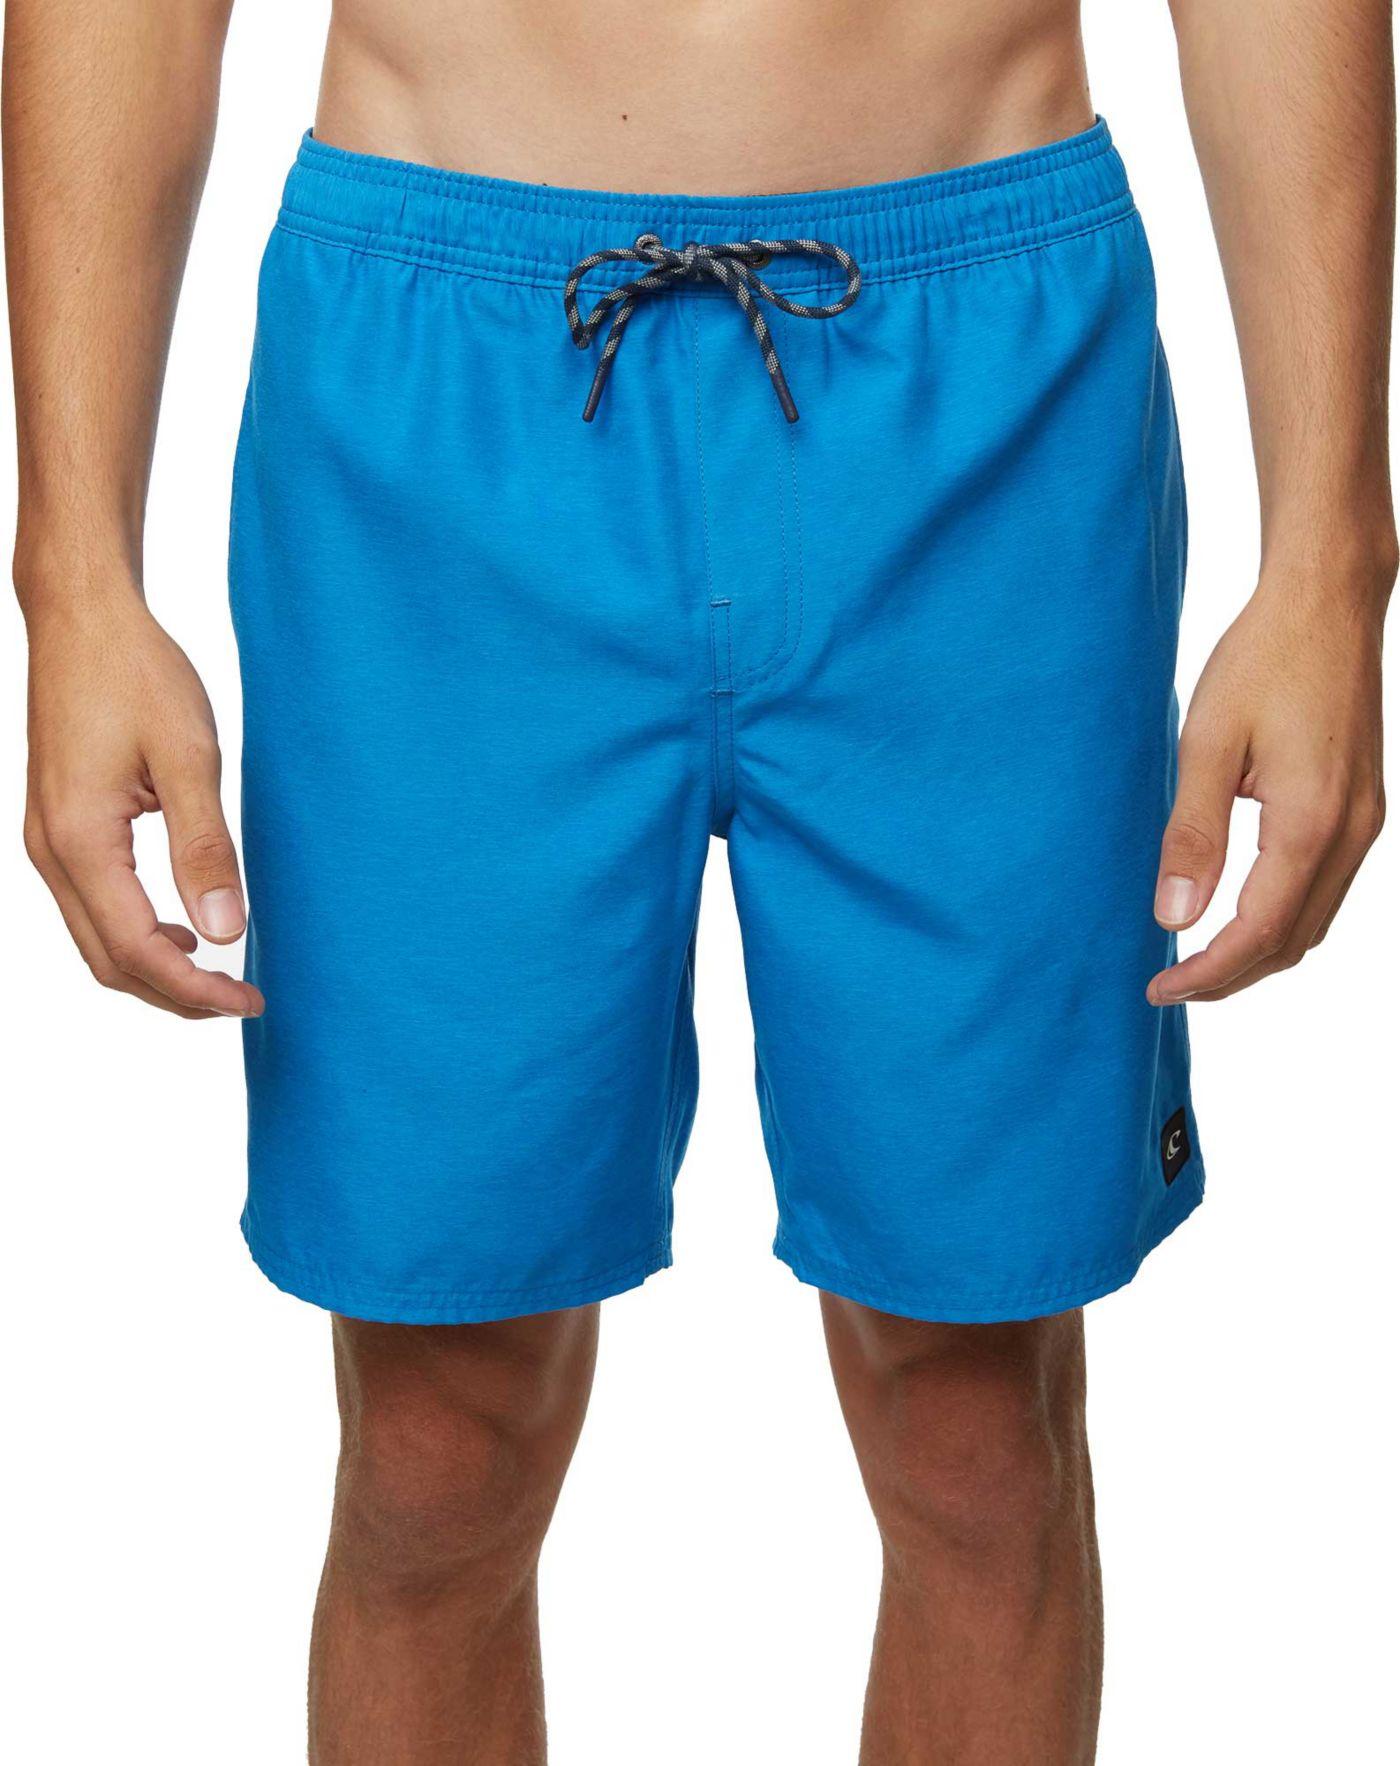 O'Neill Men's Crescent Bay Volley Cruzer Hybrid Shorts